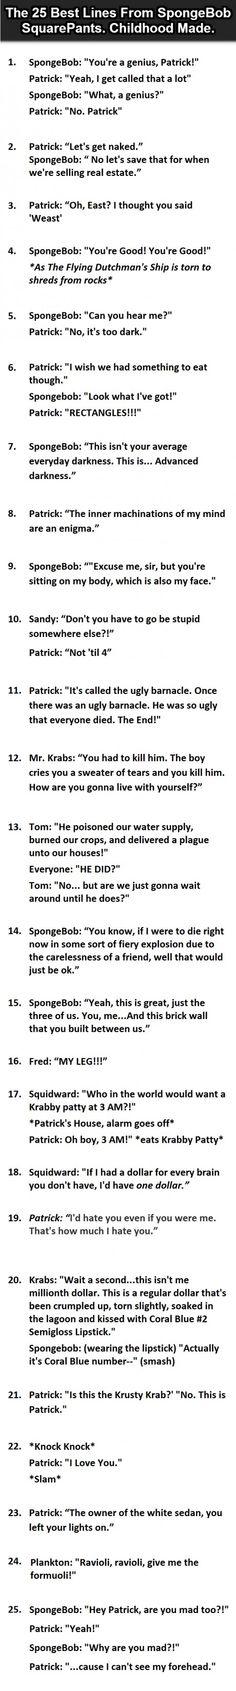 The Best Lines From #SpongeBobSquarepants.